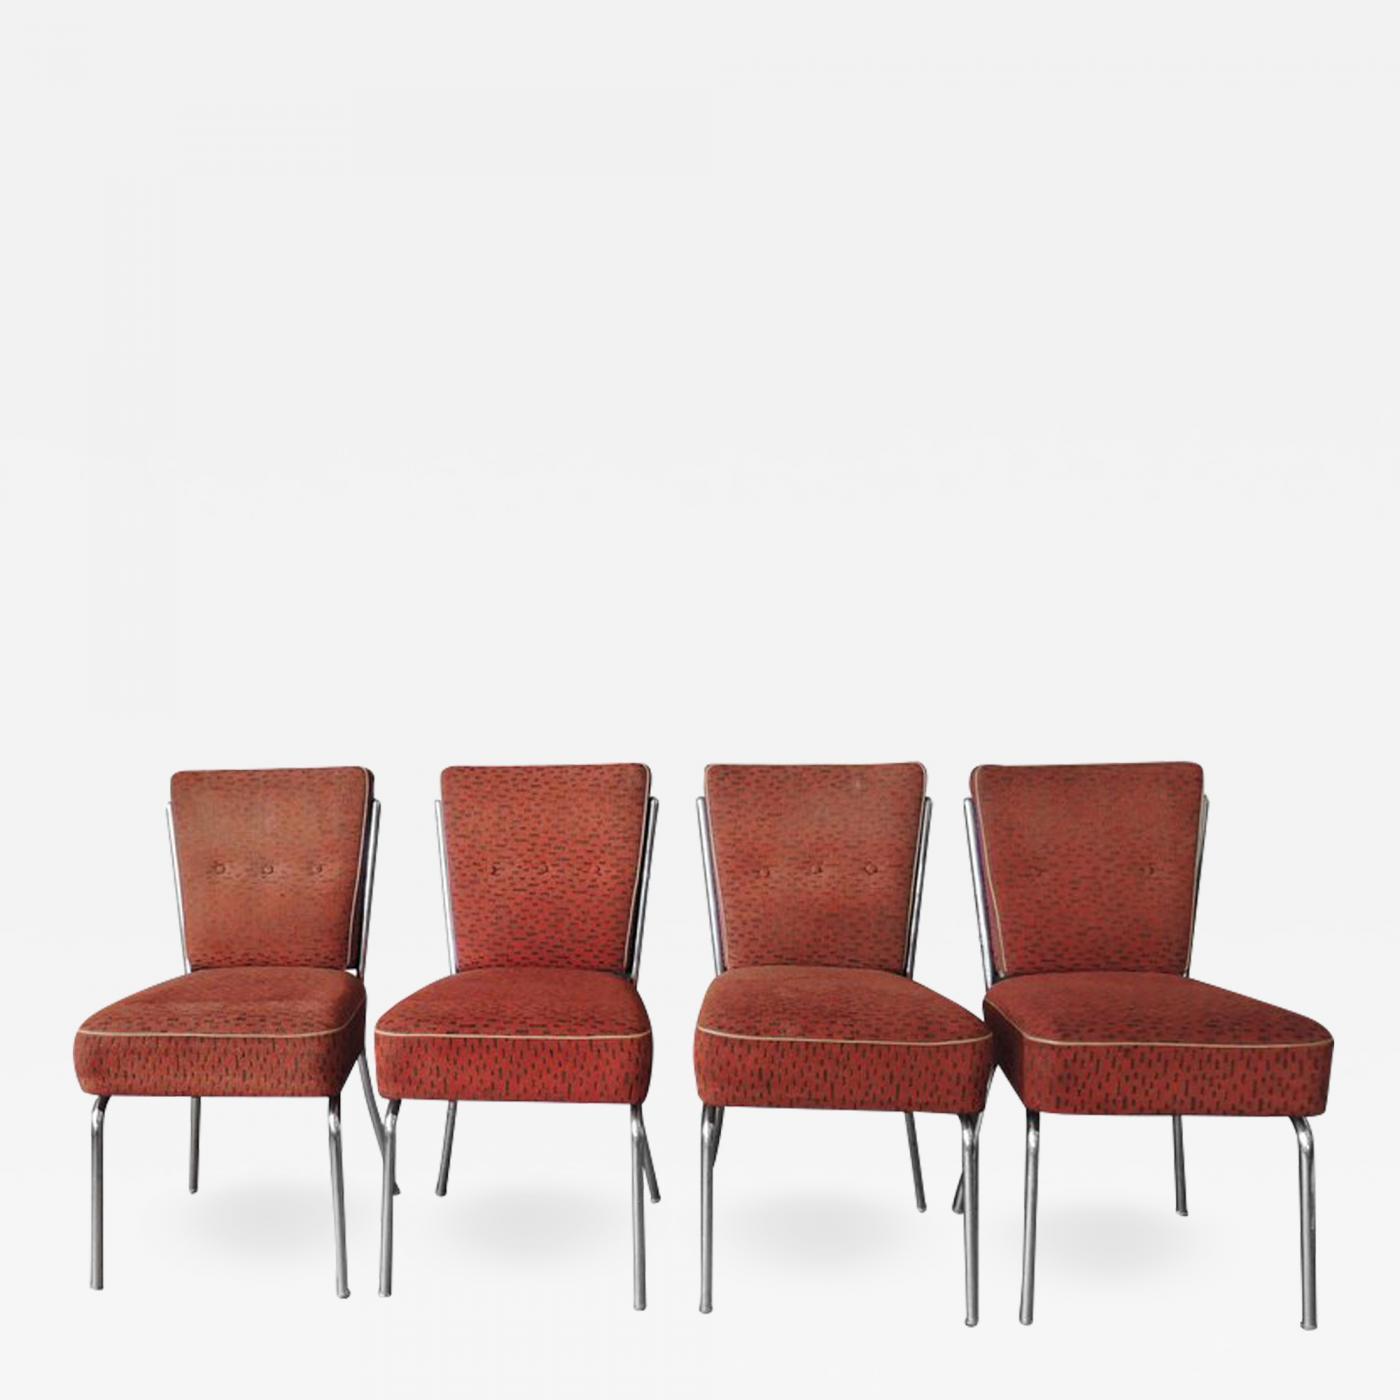 Admirable Set Of Four Czech 1930S Tubular Chrome Chairs Ncnpc Chair Design For Home Ncnpcorg